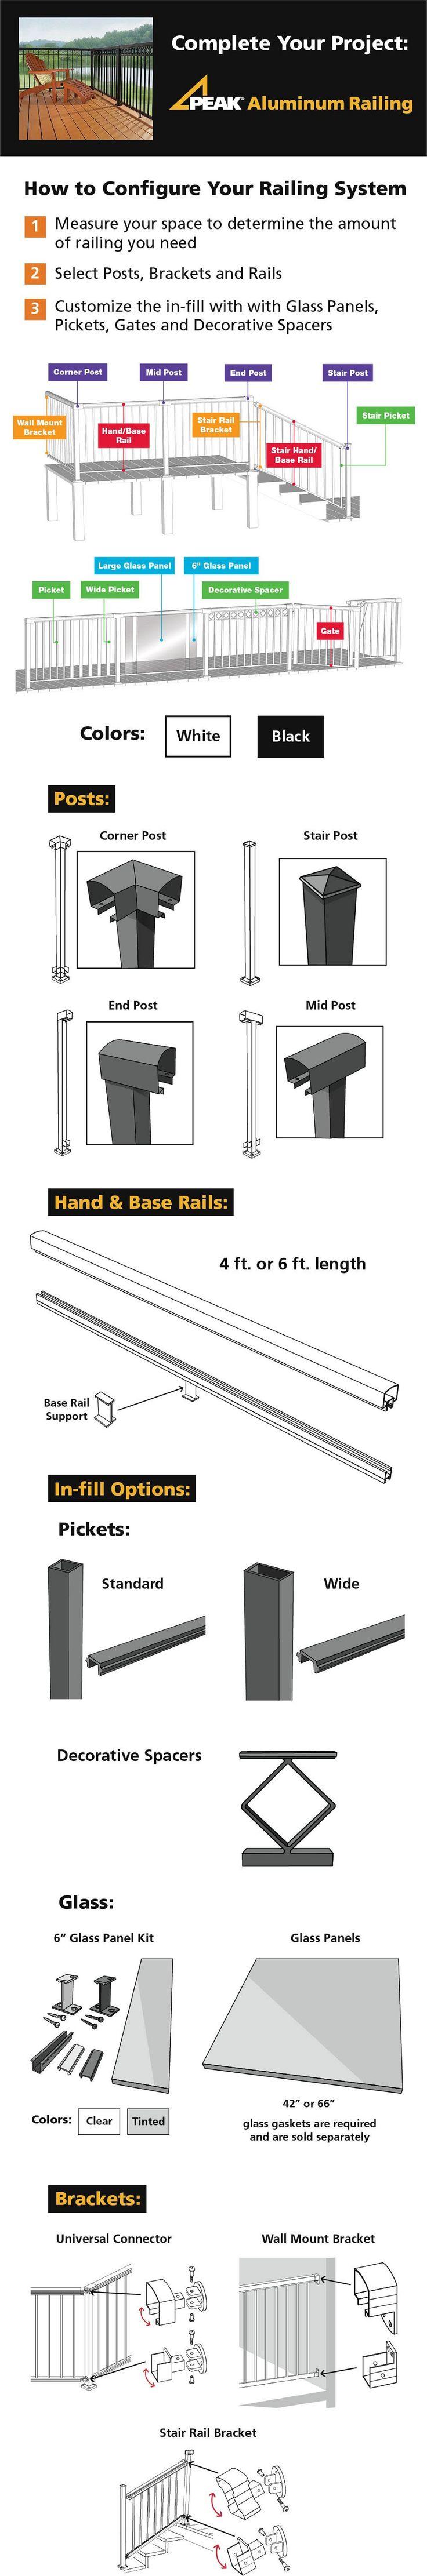 Peak Aluminum Railing 6 in. Clear Glass Panel Kit-50710 - The Home Depot